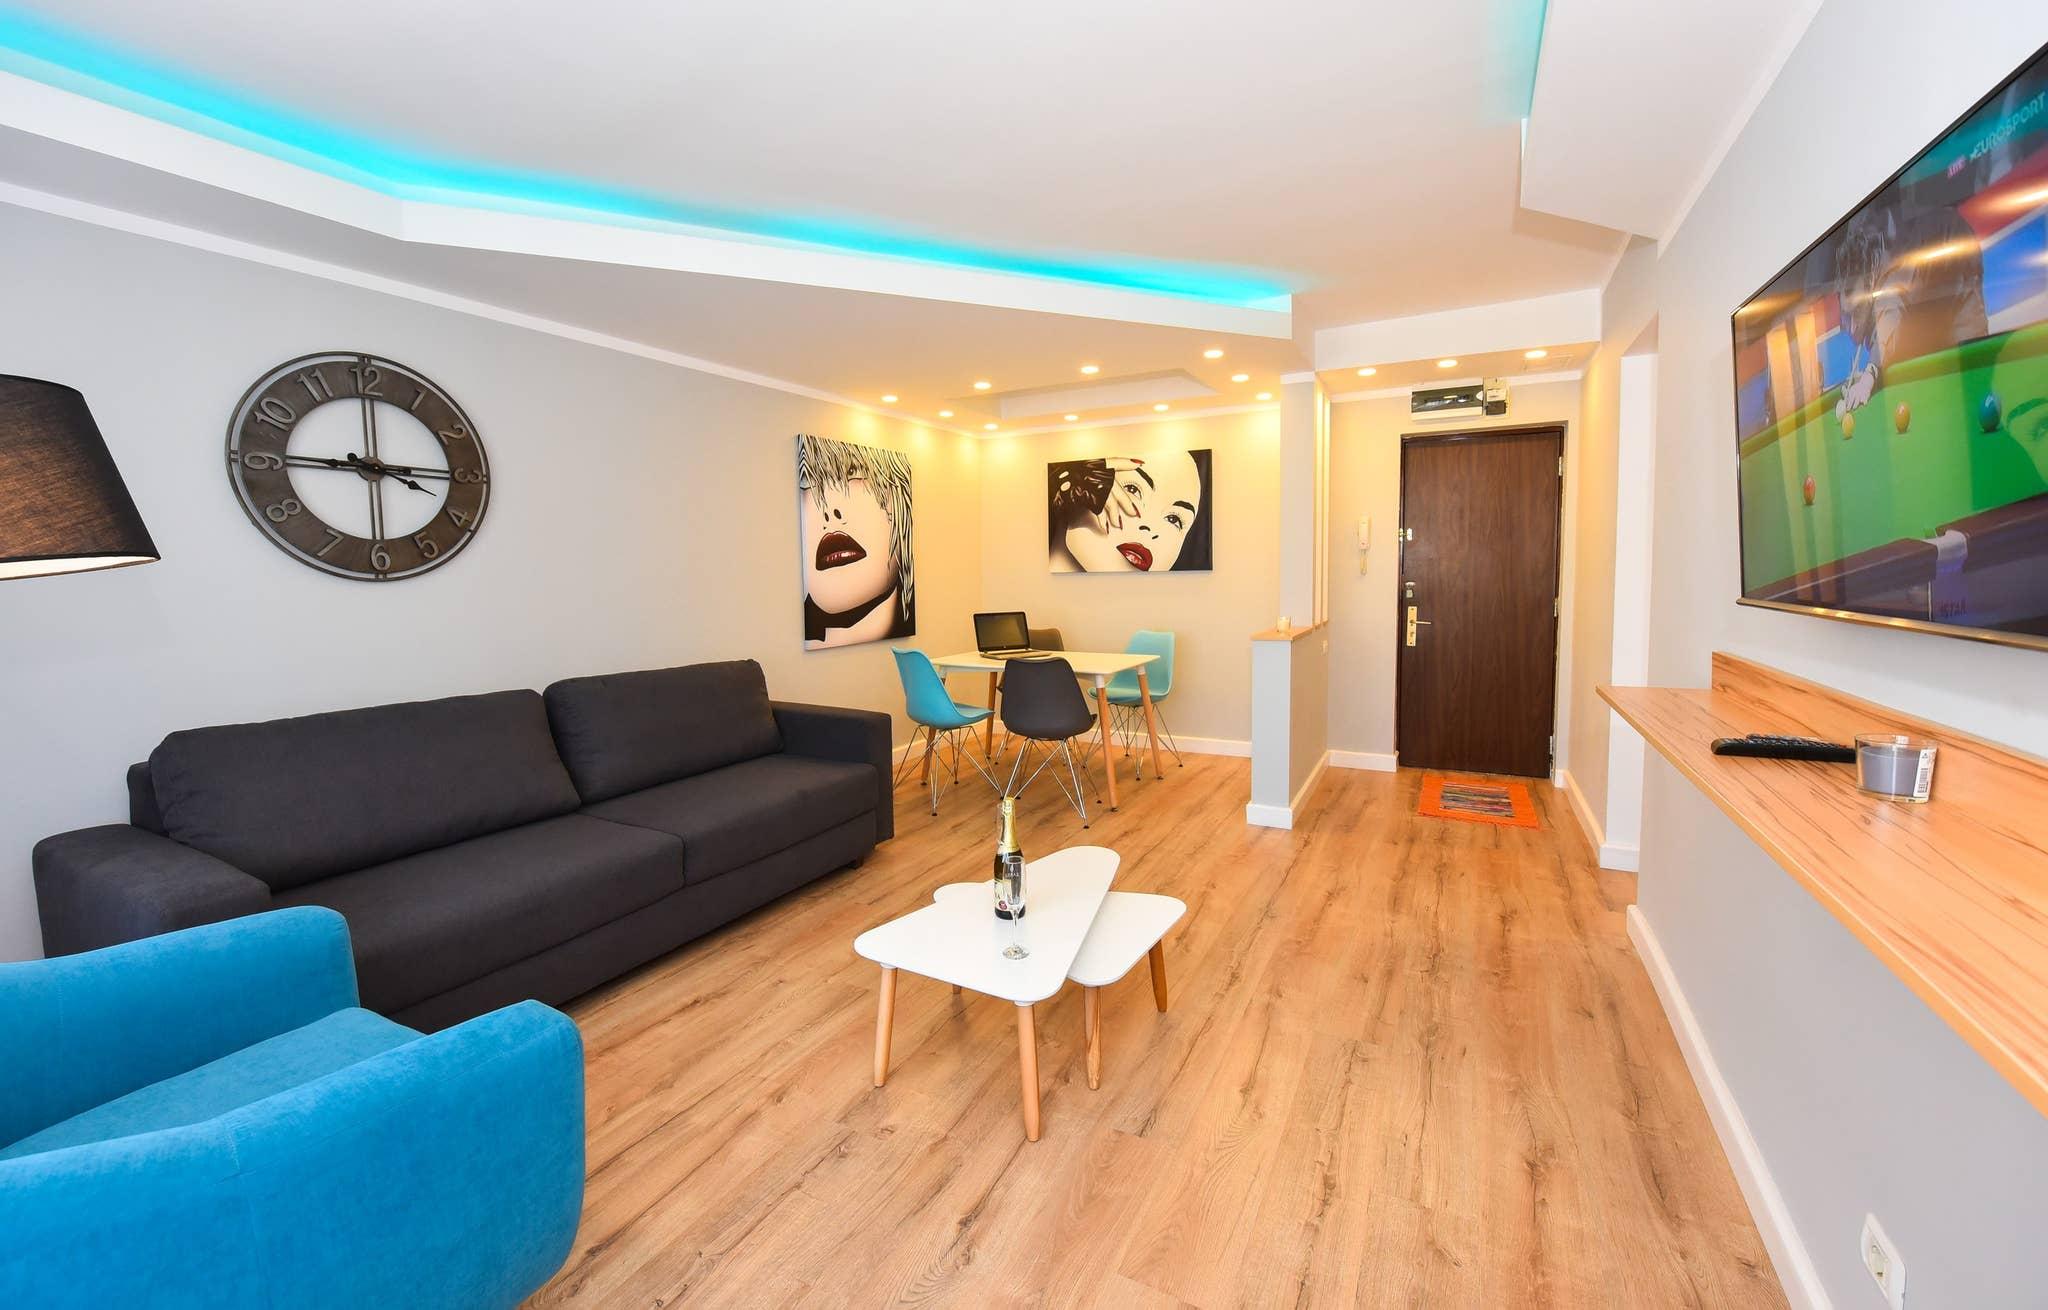 Twin 3 Apartment Cismigiu Garten